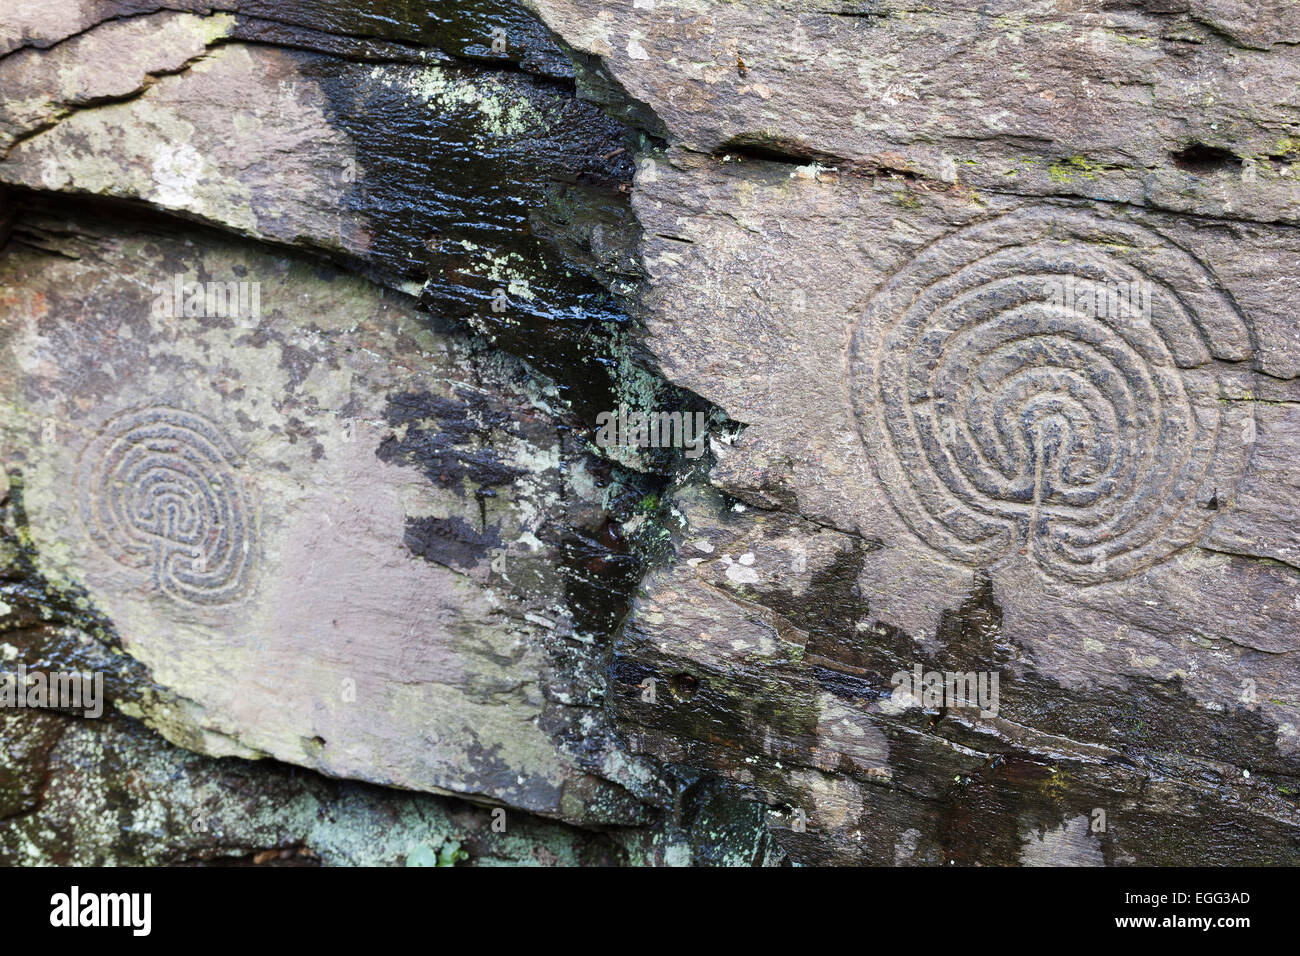 'Rocky Valley' rock carvings, labyrinth petroglyphs, Cornwall, England, UK - Stock Image